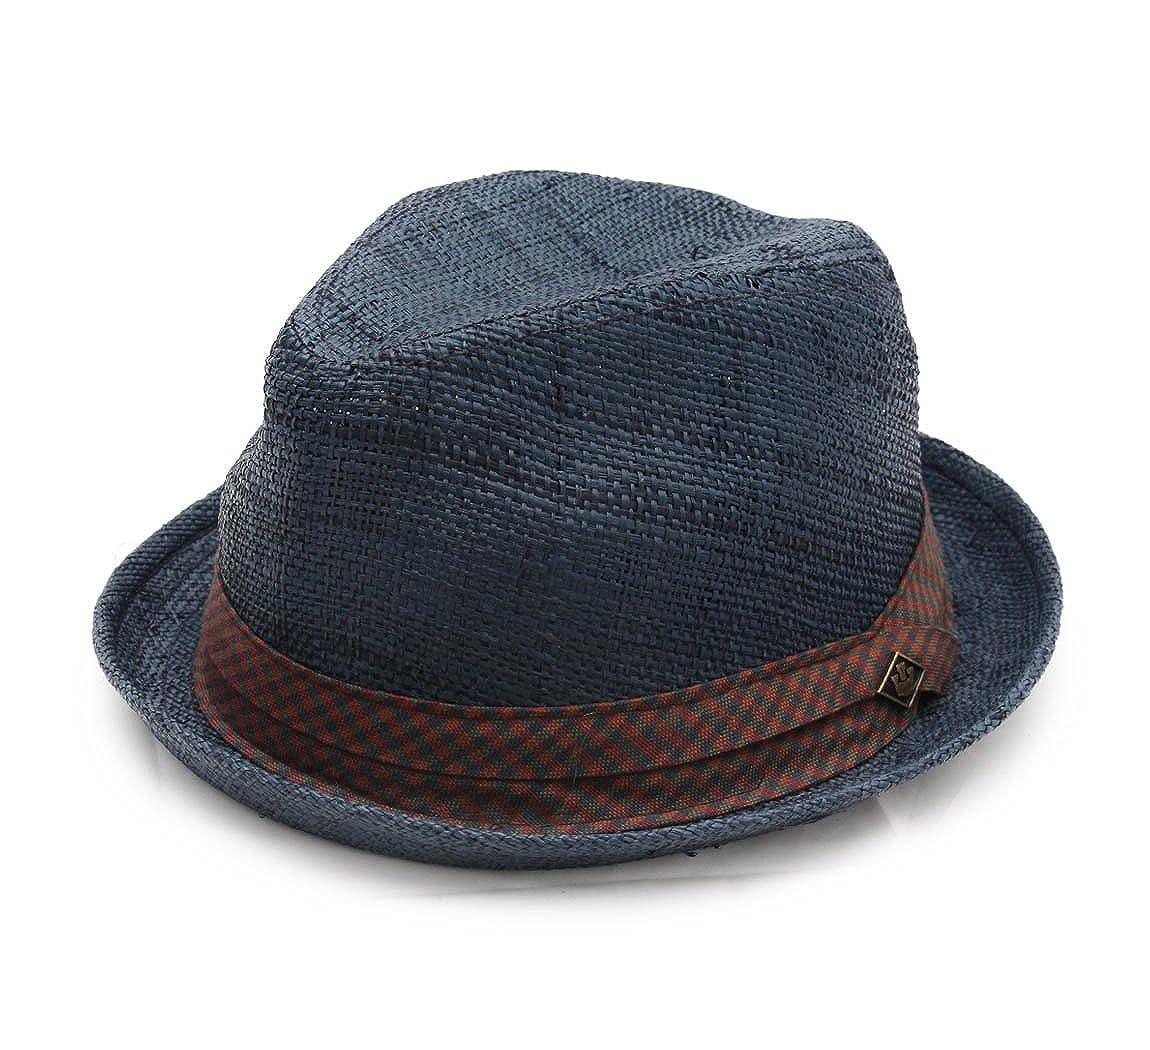 Goorin Brothers - Trilby Hat men Joey C - Size XL  Amazon.co.uk  Clothing 81b857e5be36